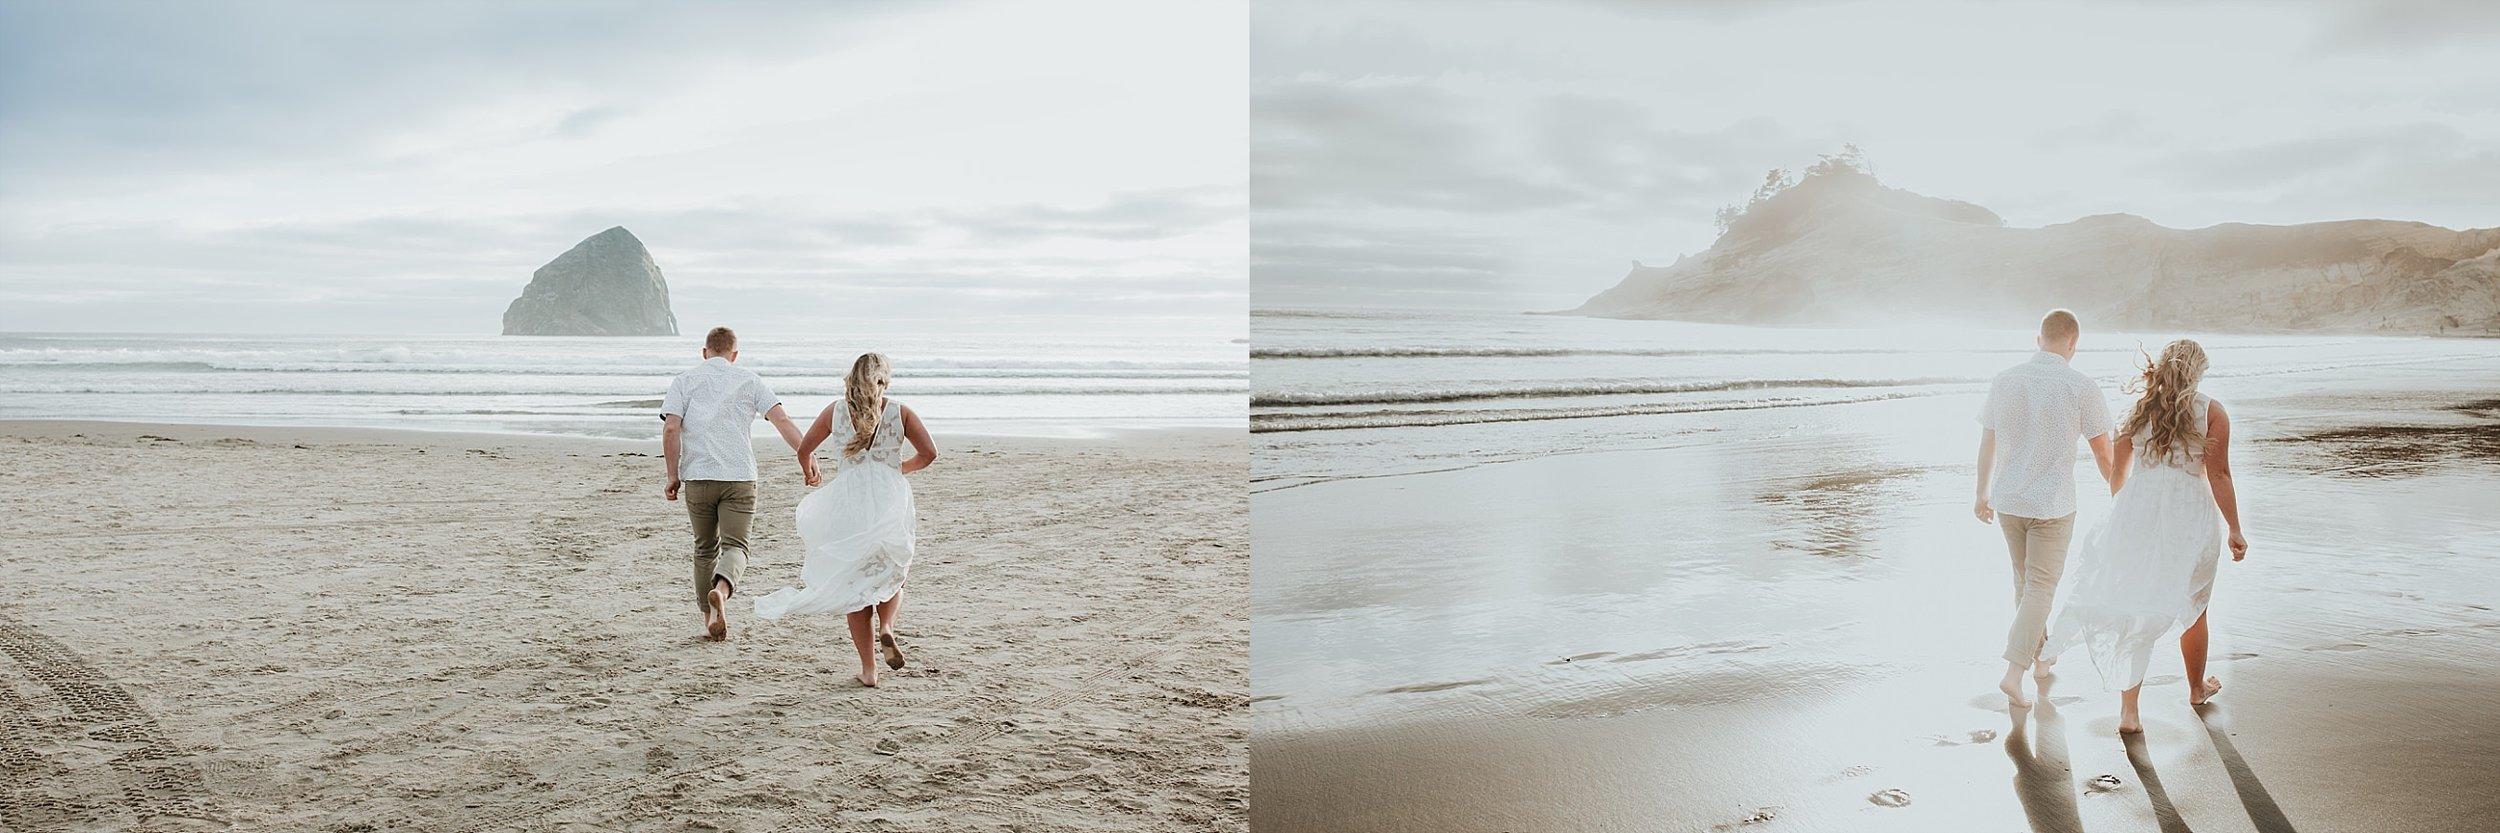 Lincoln City Oregon Coast engagement Photographer (6).jpg